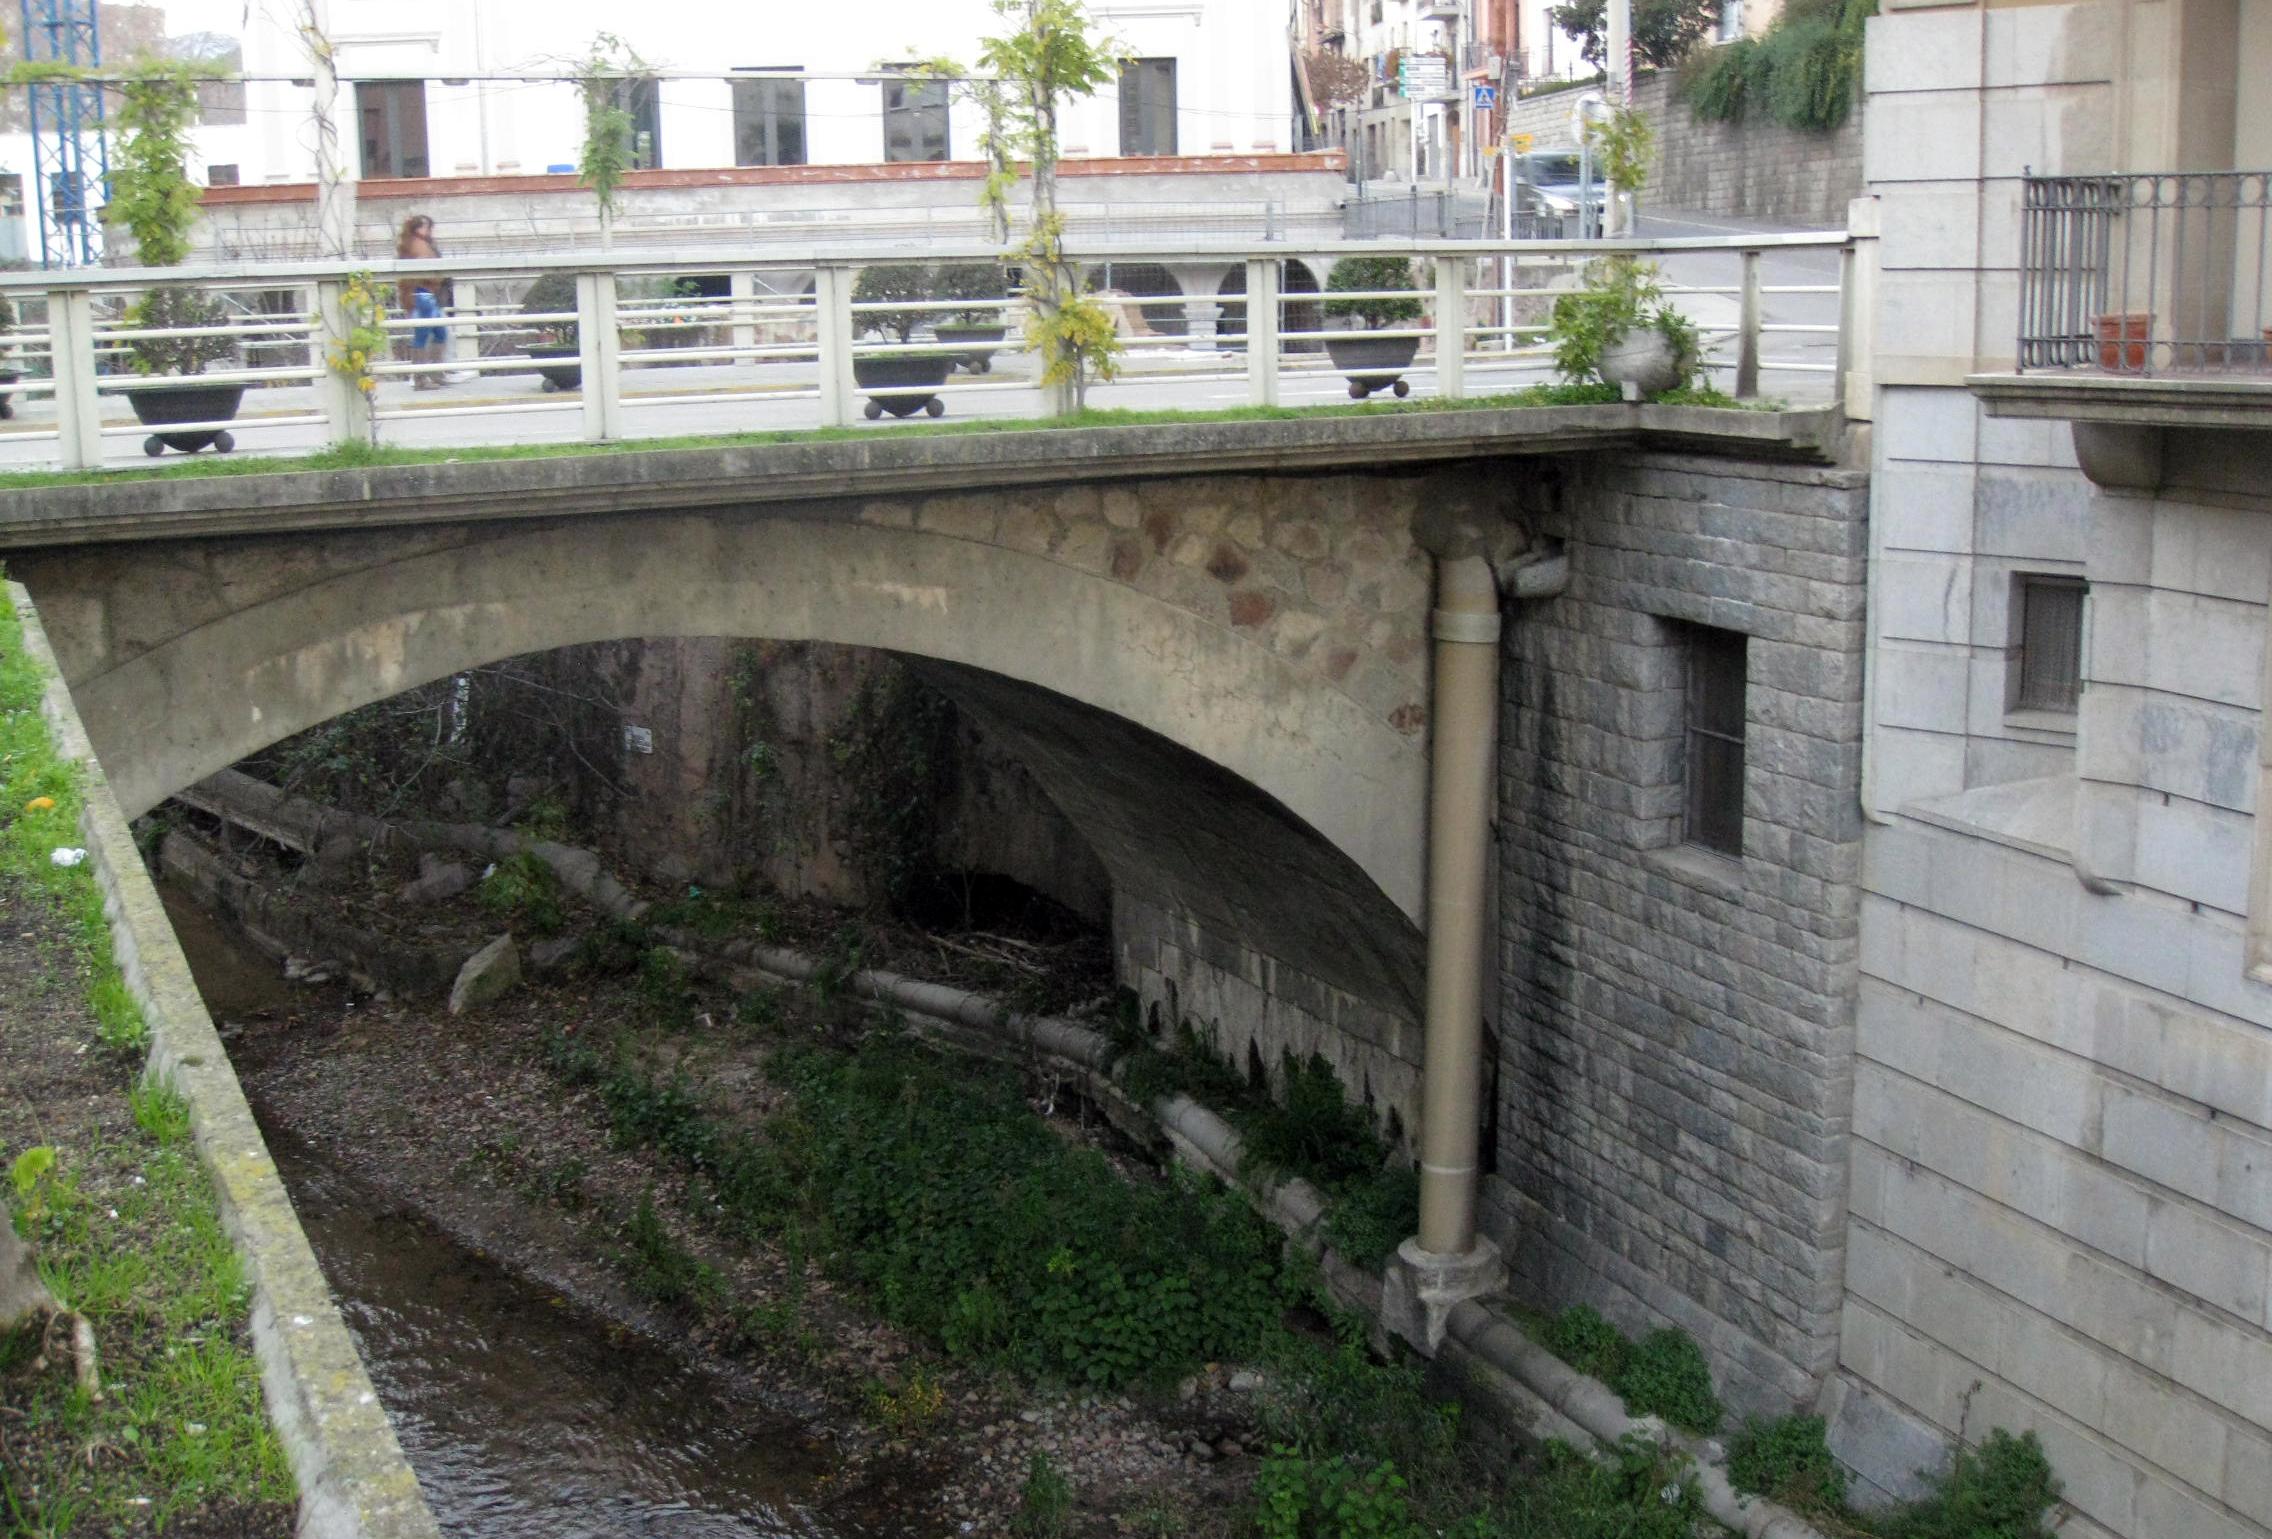 File:140 Pont de la Vila (Arbúcies).jpg - Wikimedia Commons